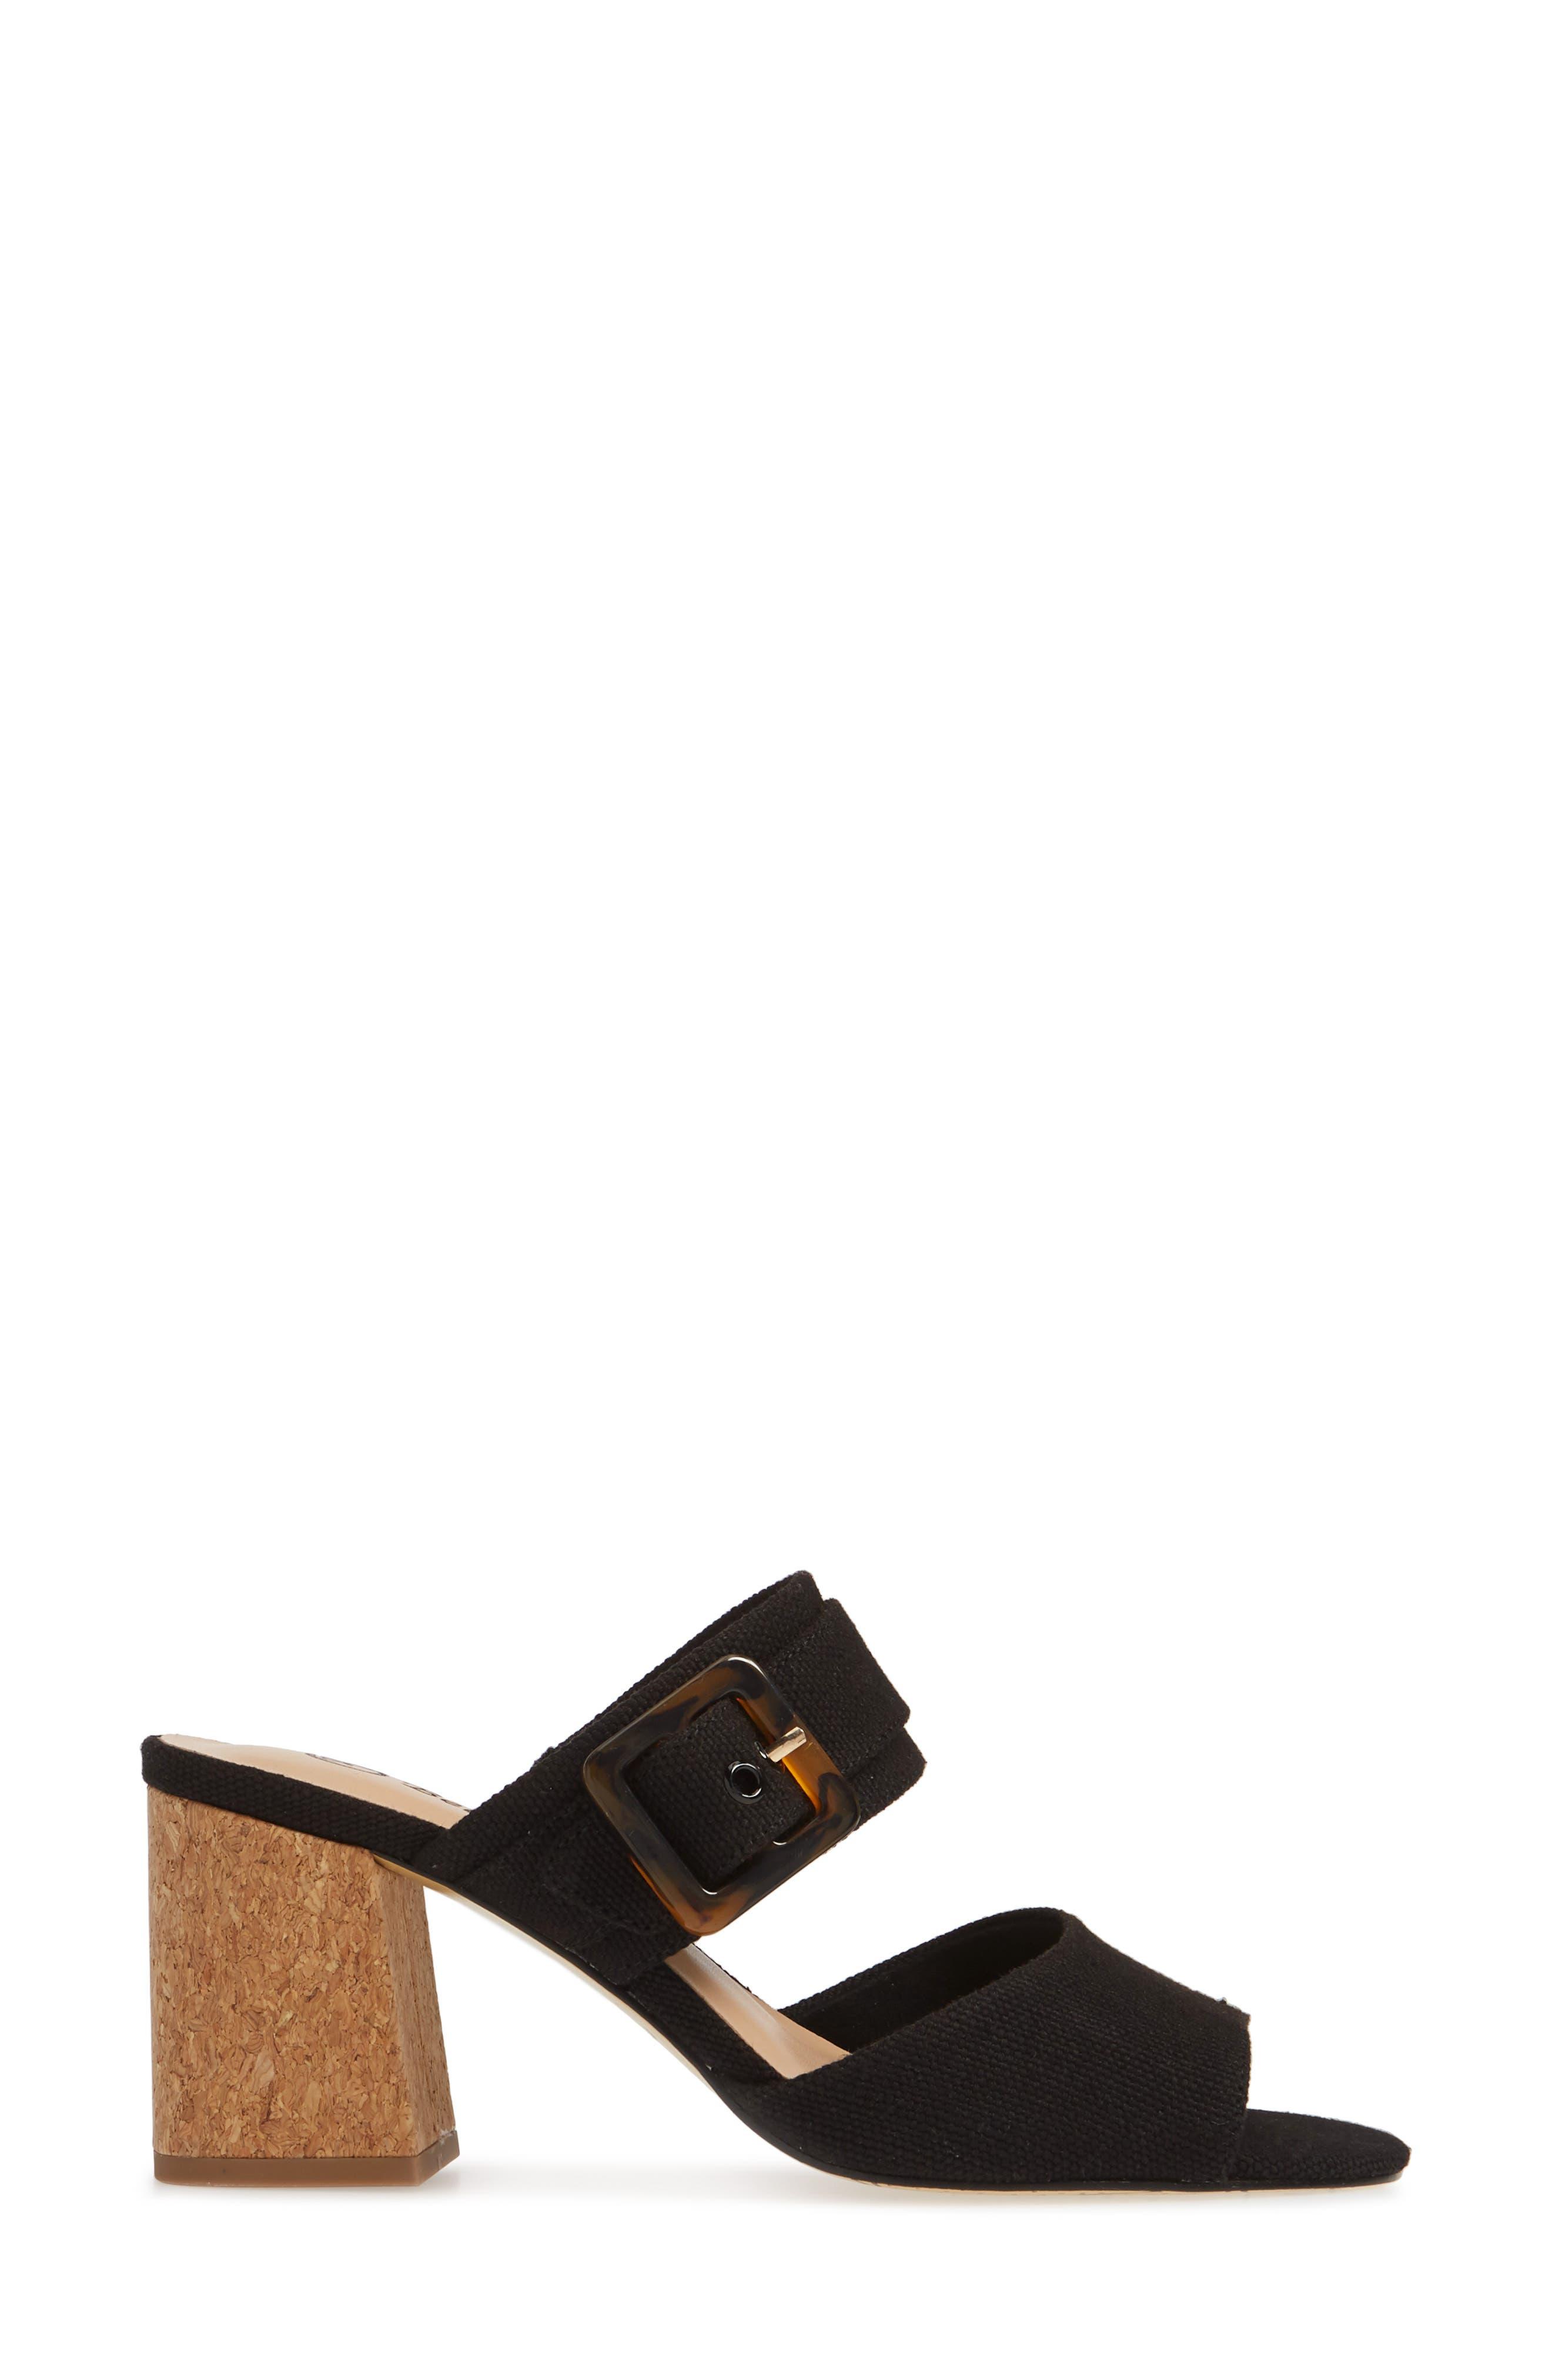 BELLA VITA, Tory II Buckle Slide Sandal, Alternate thumbnail 3, color, BLACK LINEN FABRIC